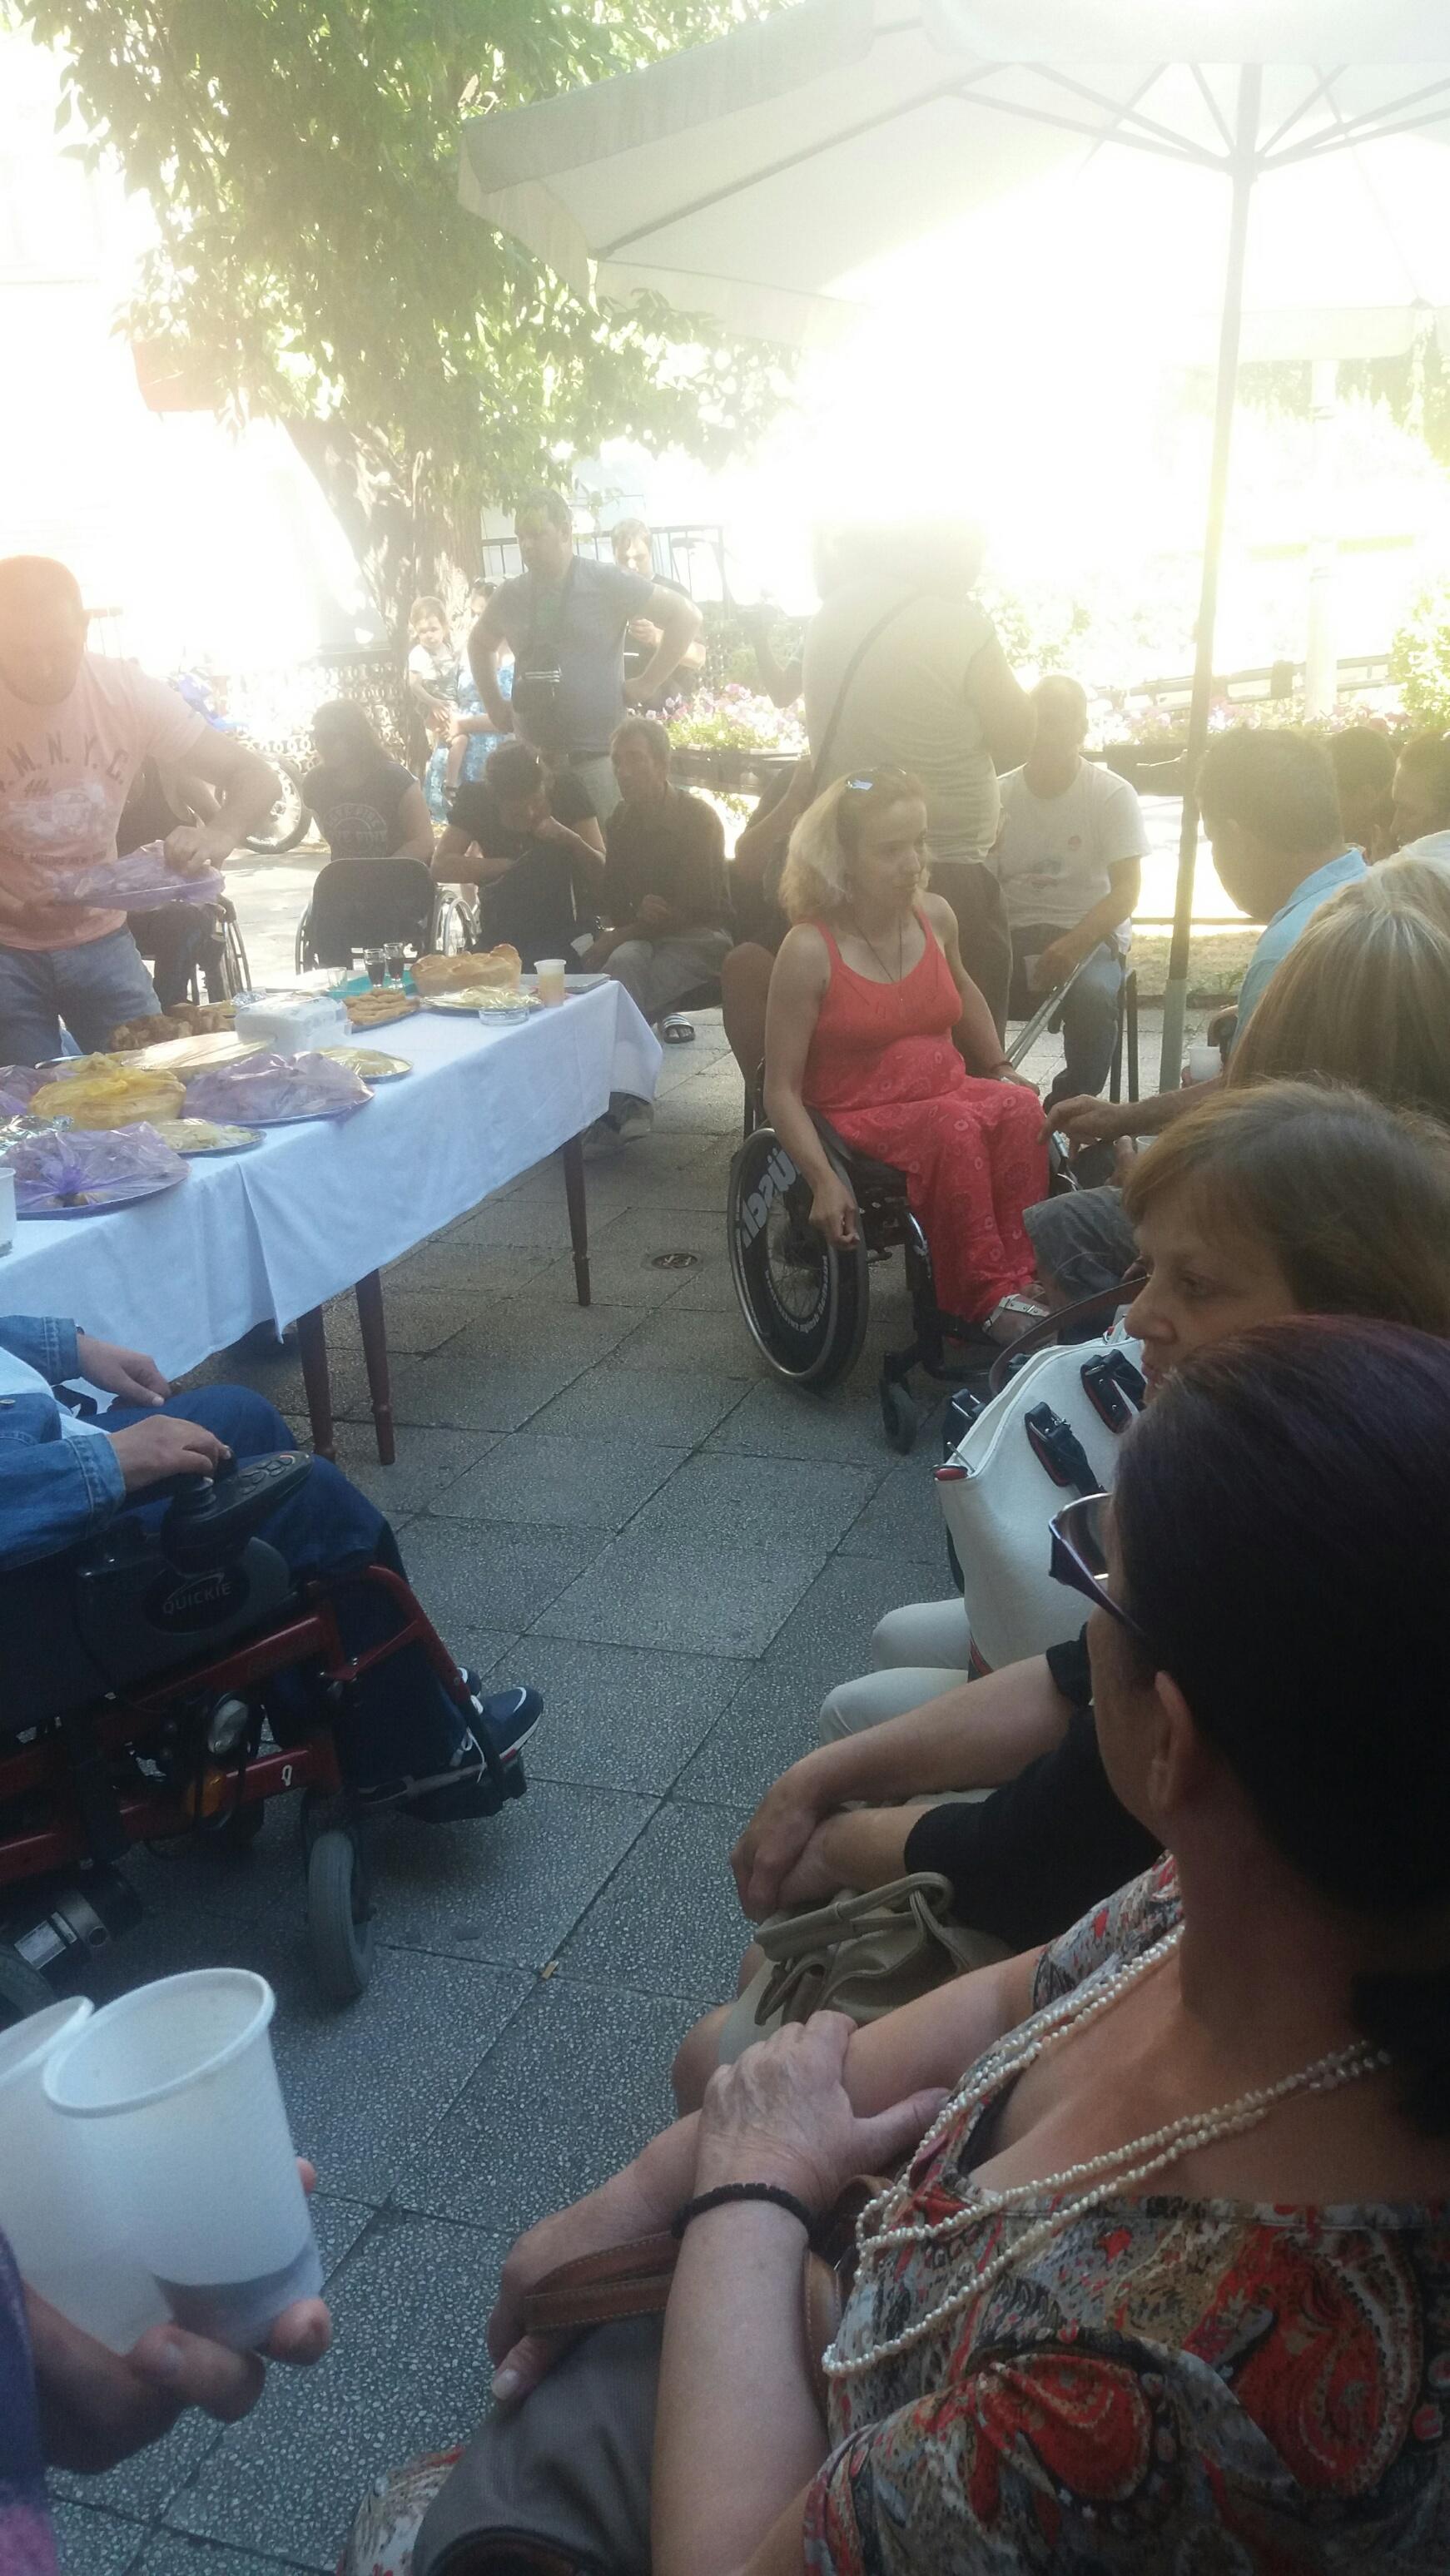 Udruženje paraplegičara Smederevo - Sveti Kozma i Damjan